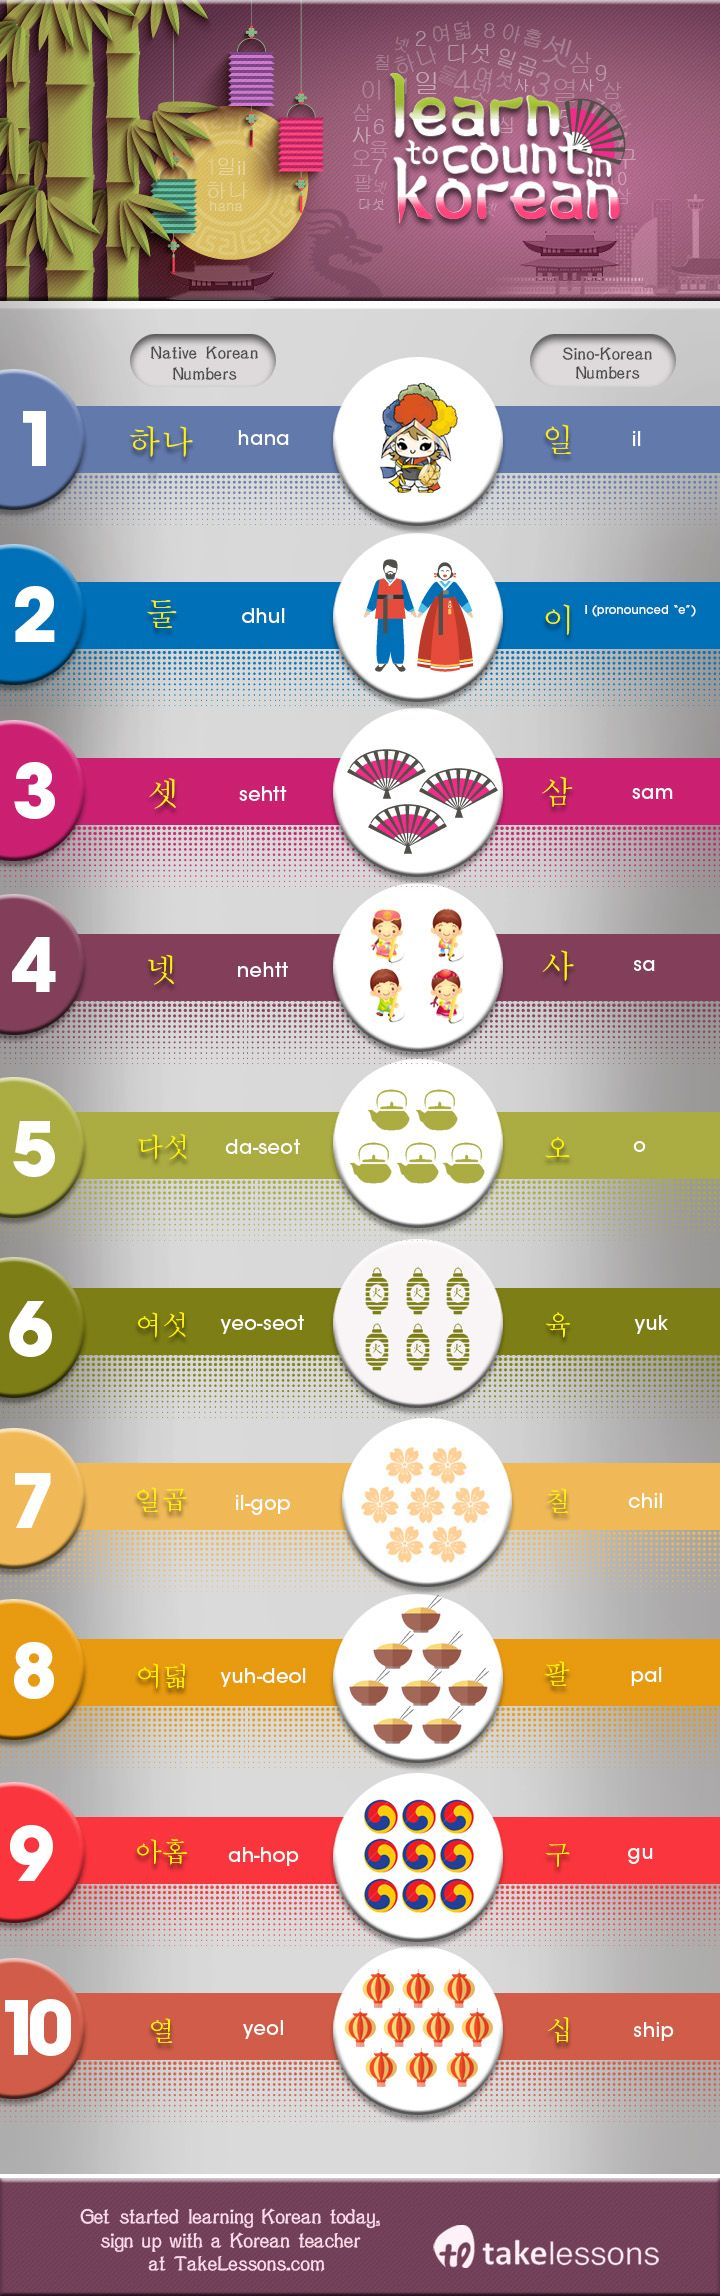 Counting in Korean: A Beginner's Guide to Korean Numbers http://takelessons.com/blog/Guide-to-Korean-Numbers-z11?utm_source=social&utm_medium=blog&utm_campaign=pinterest